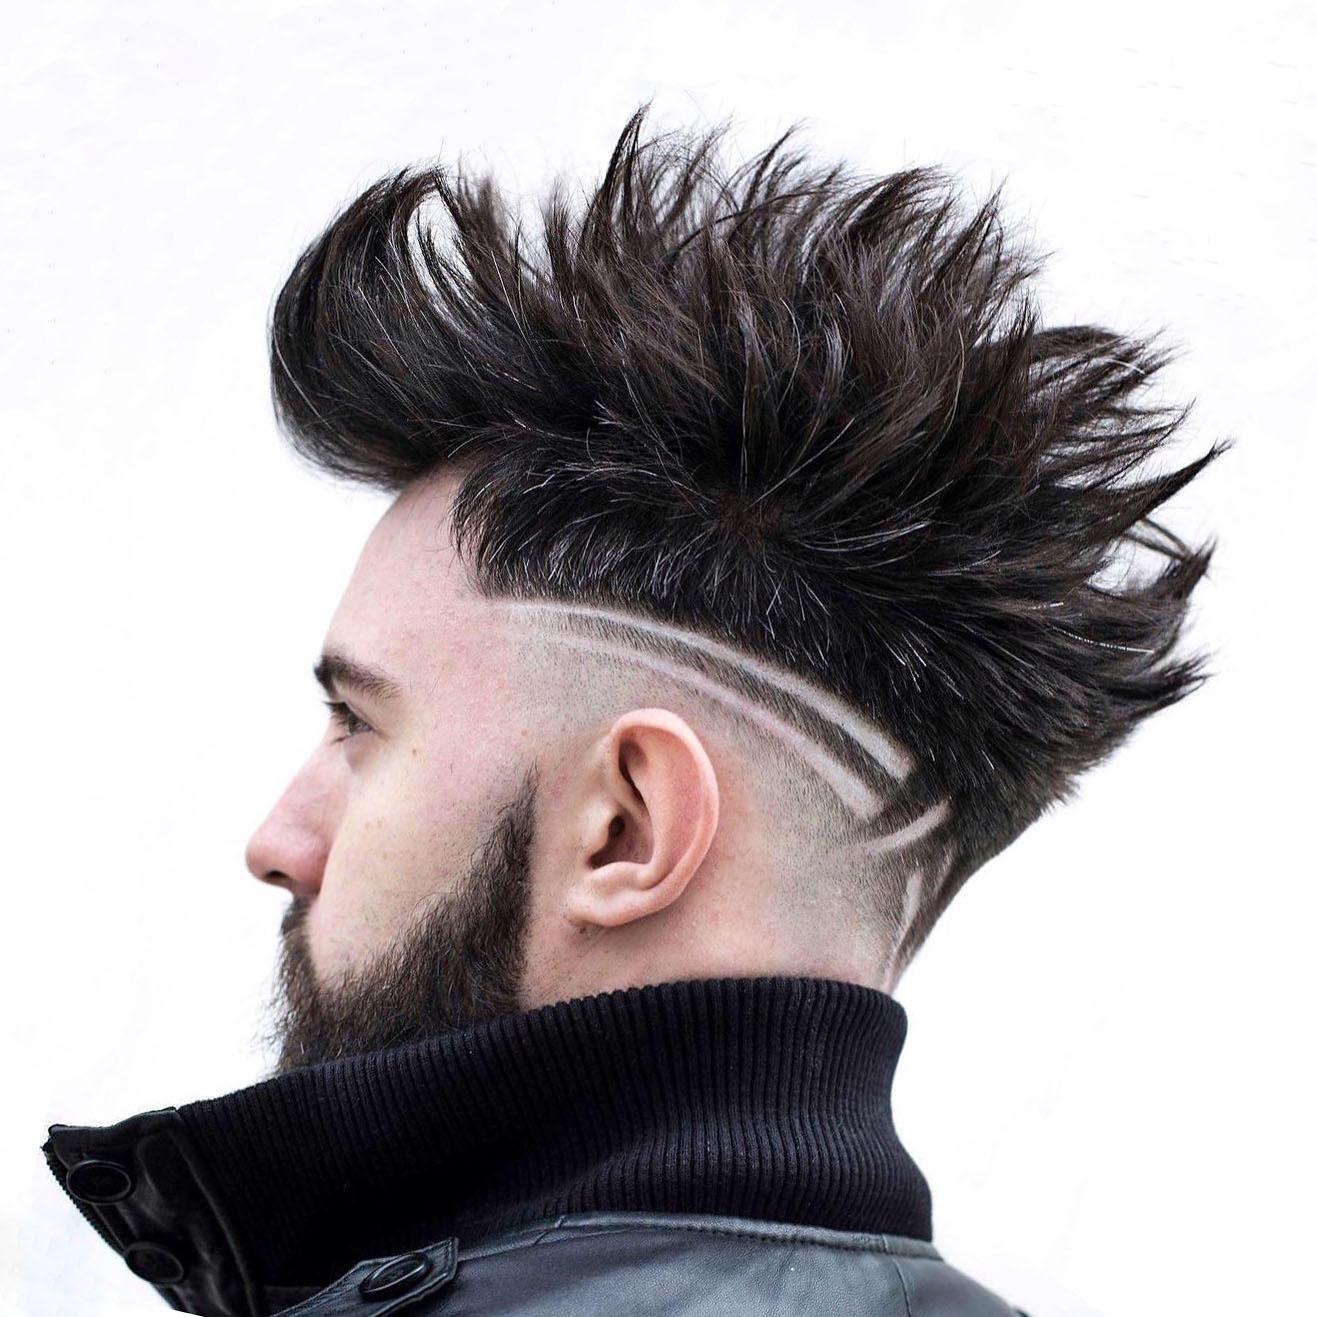 Cool Long Spiky Undercut Design for Men - side view